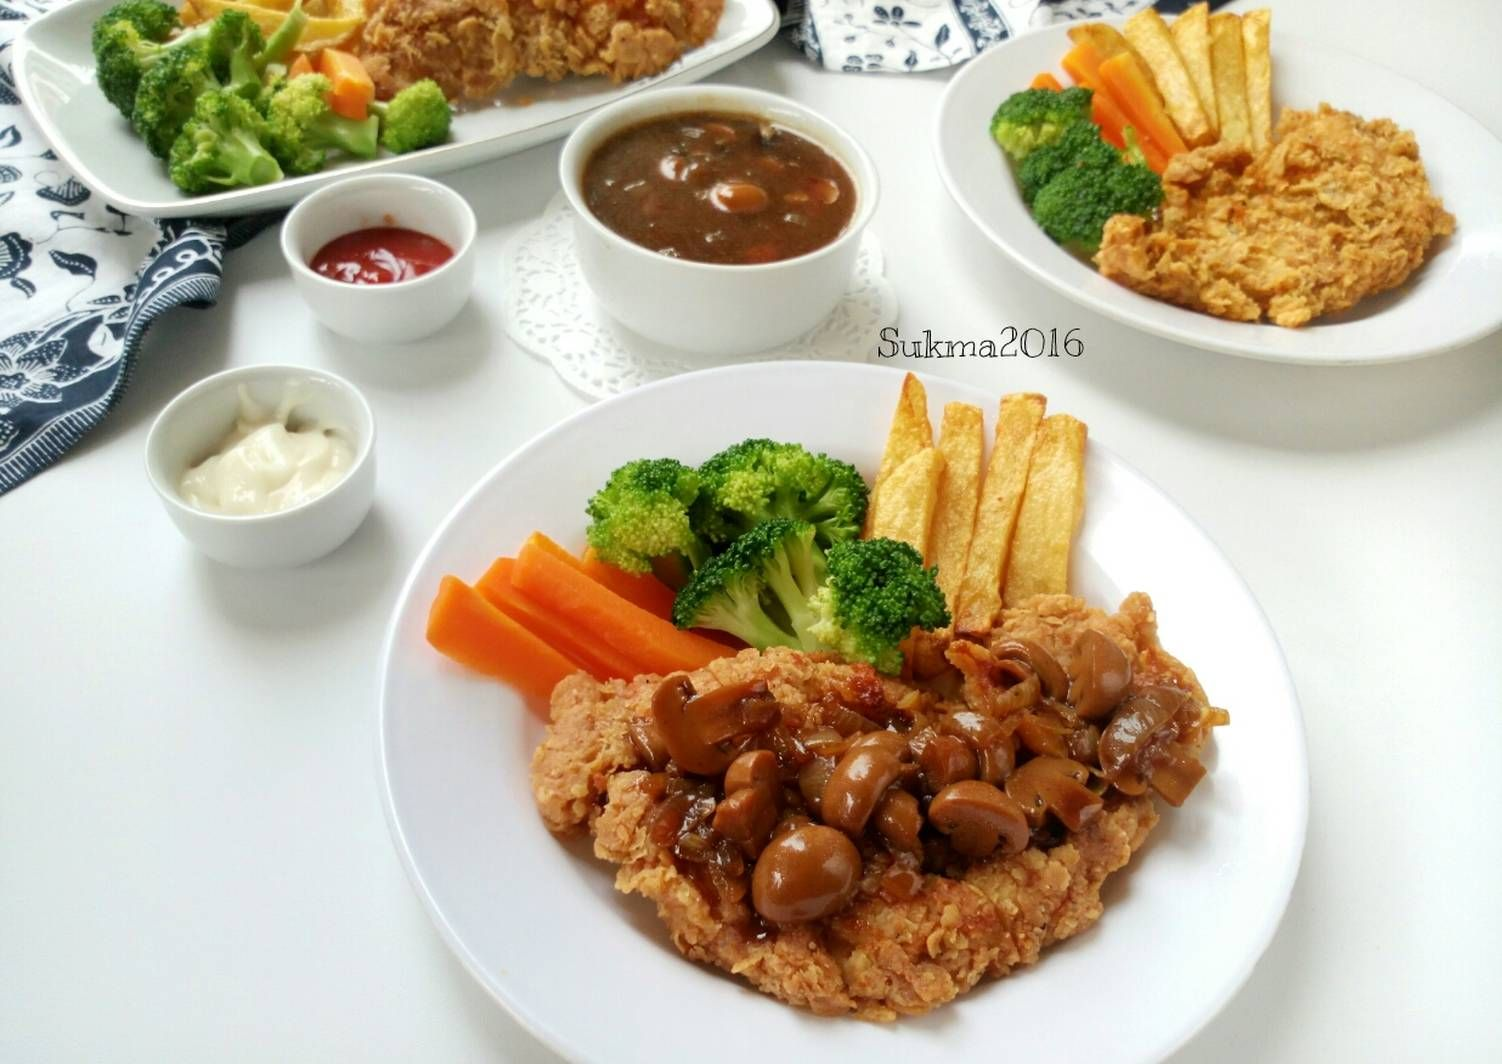 Resep Steak Ayam Crispy Saus Jamur Oleh Sukmawati Rs Resep Di 2020 Resep Steak Resep Jamur Jamur